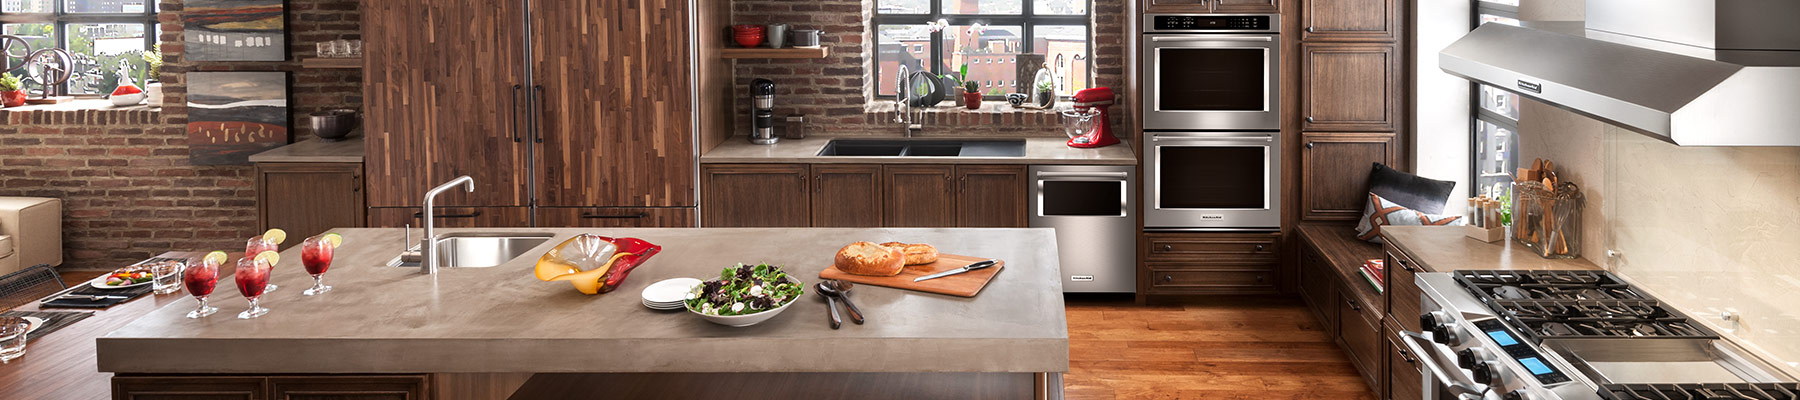 Shop Jones Home Appliance 4k Ultra Hdtv And Serta